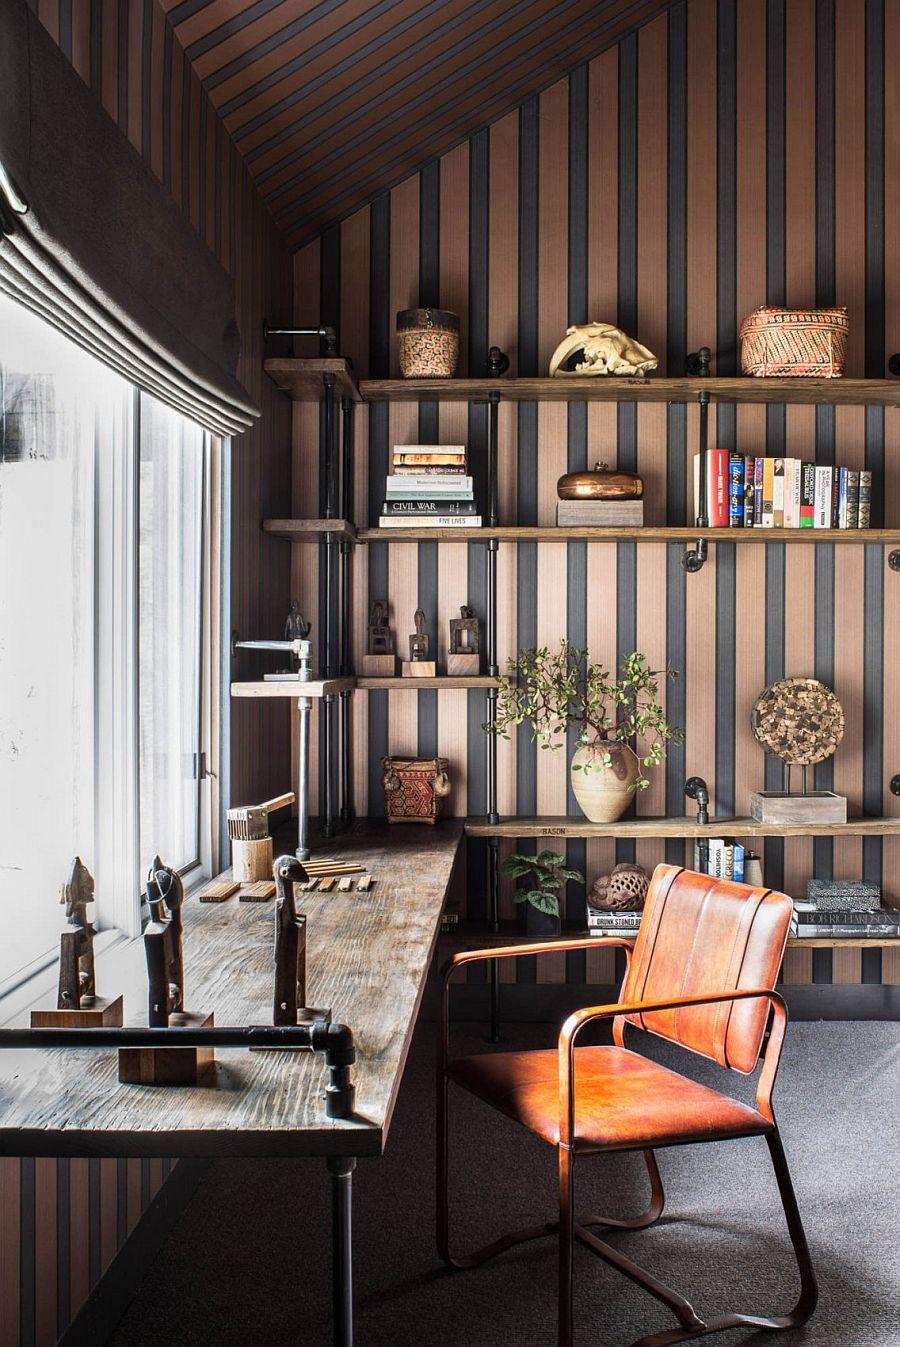 Casual and unique home workspace idea